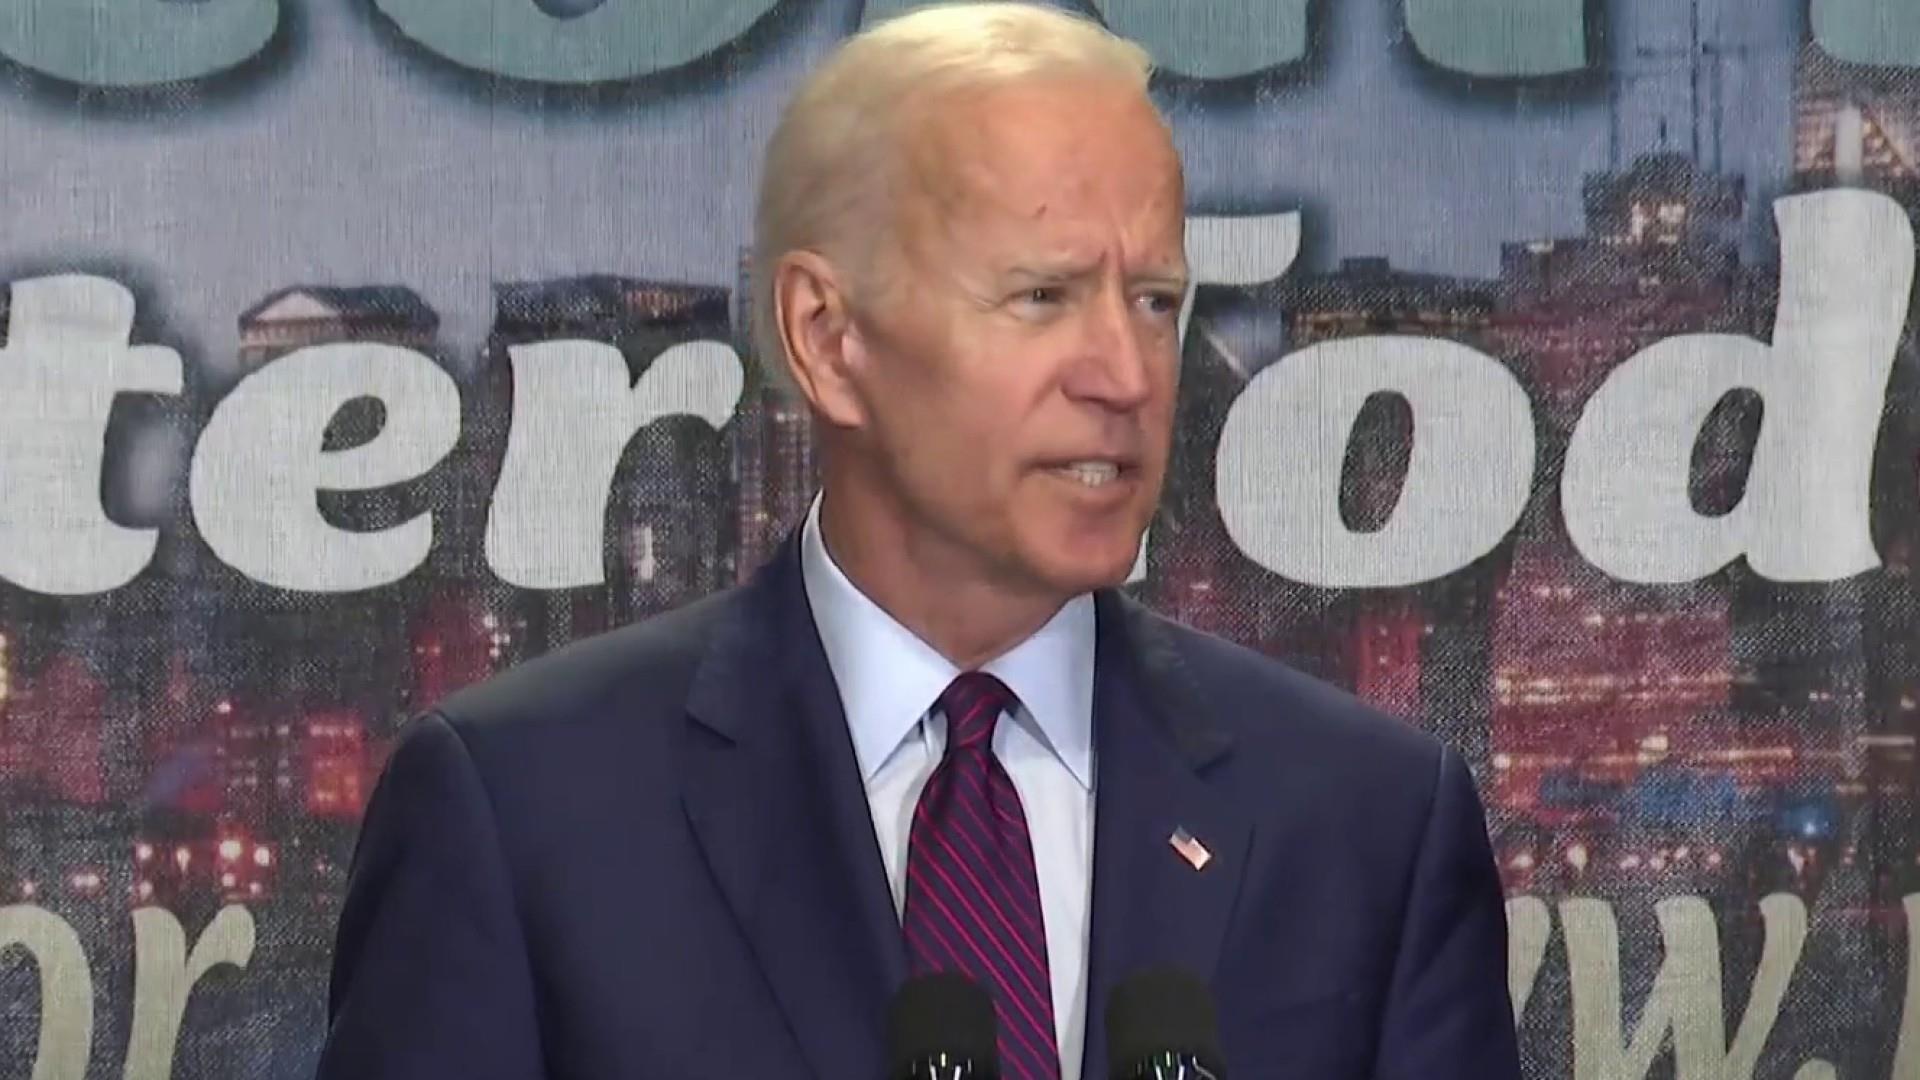 Was Biden blindsided by Harris's school busing critique?